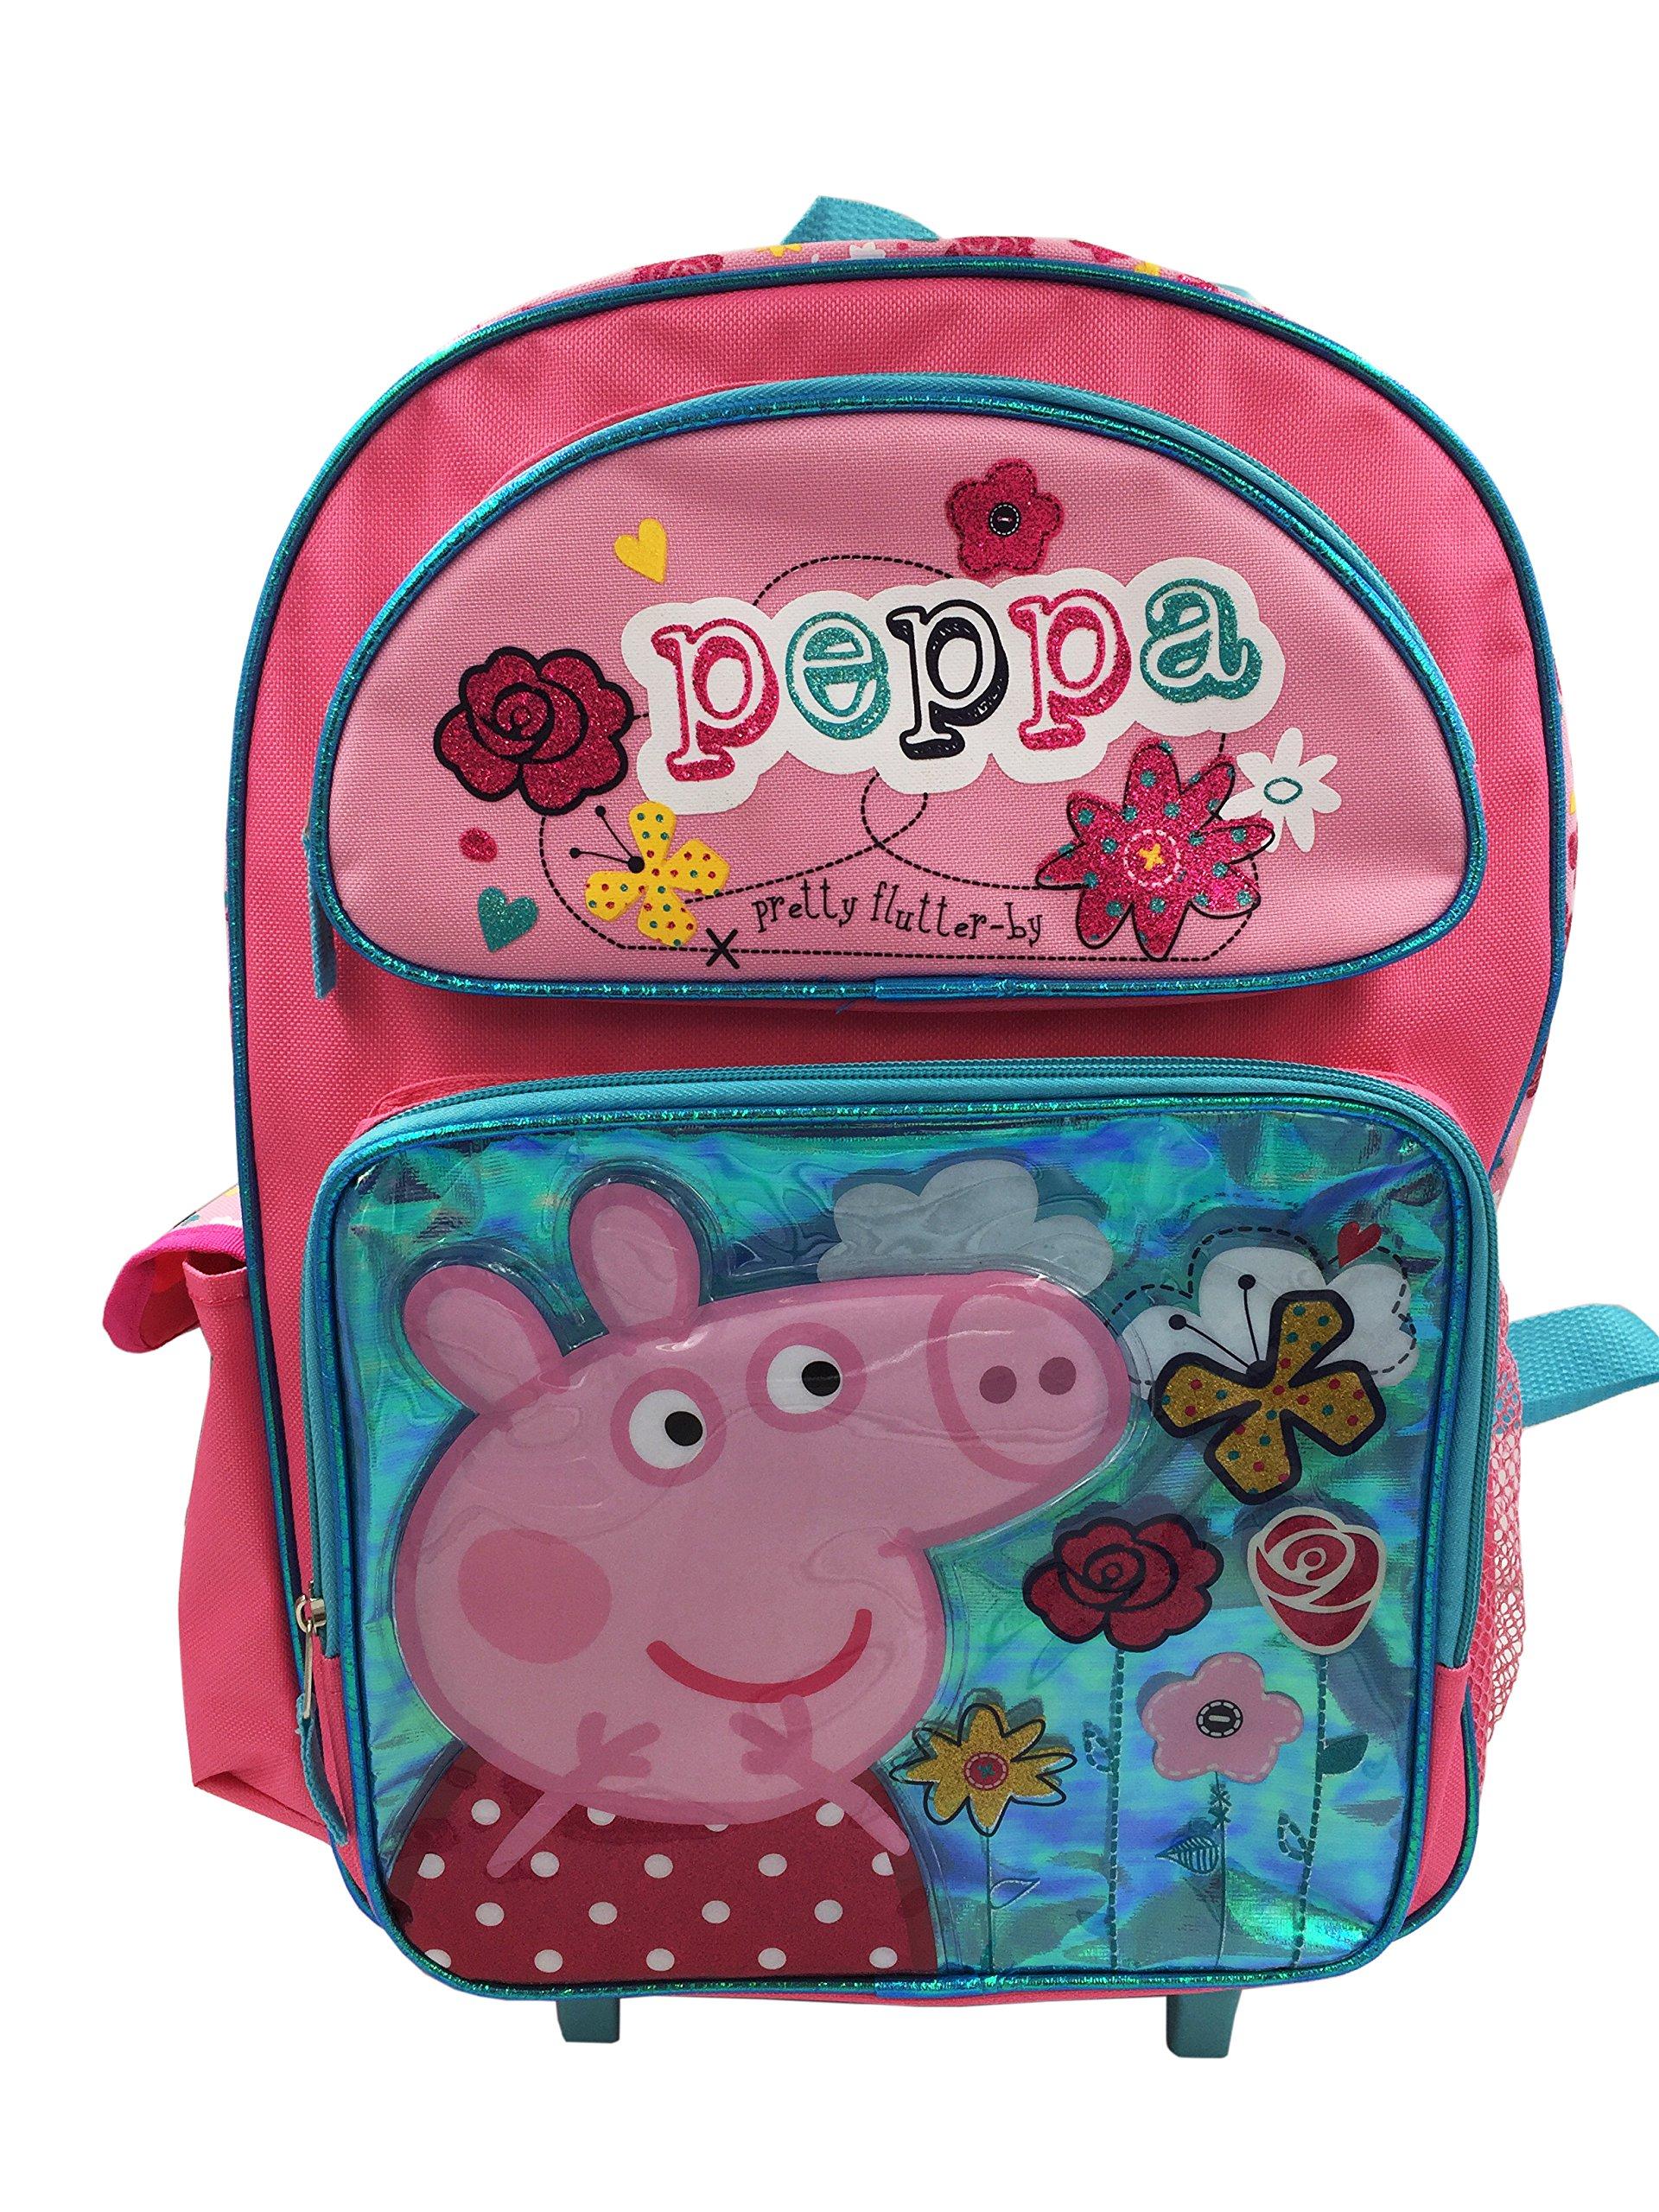 Peppa Pig 16'' Rolling Backpack